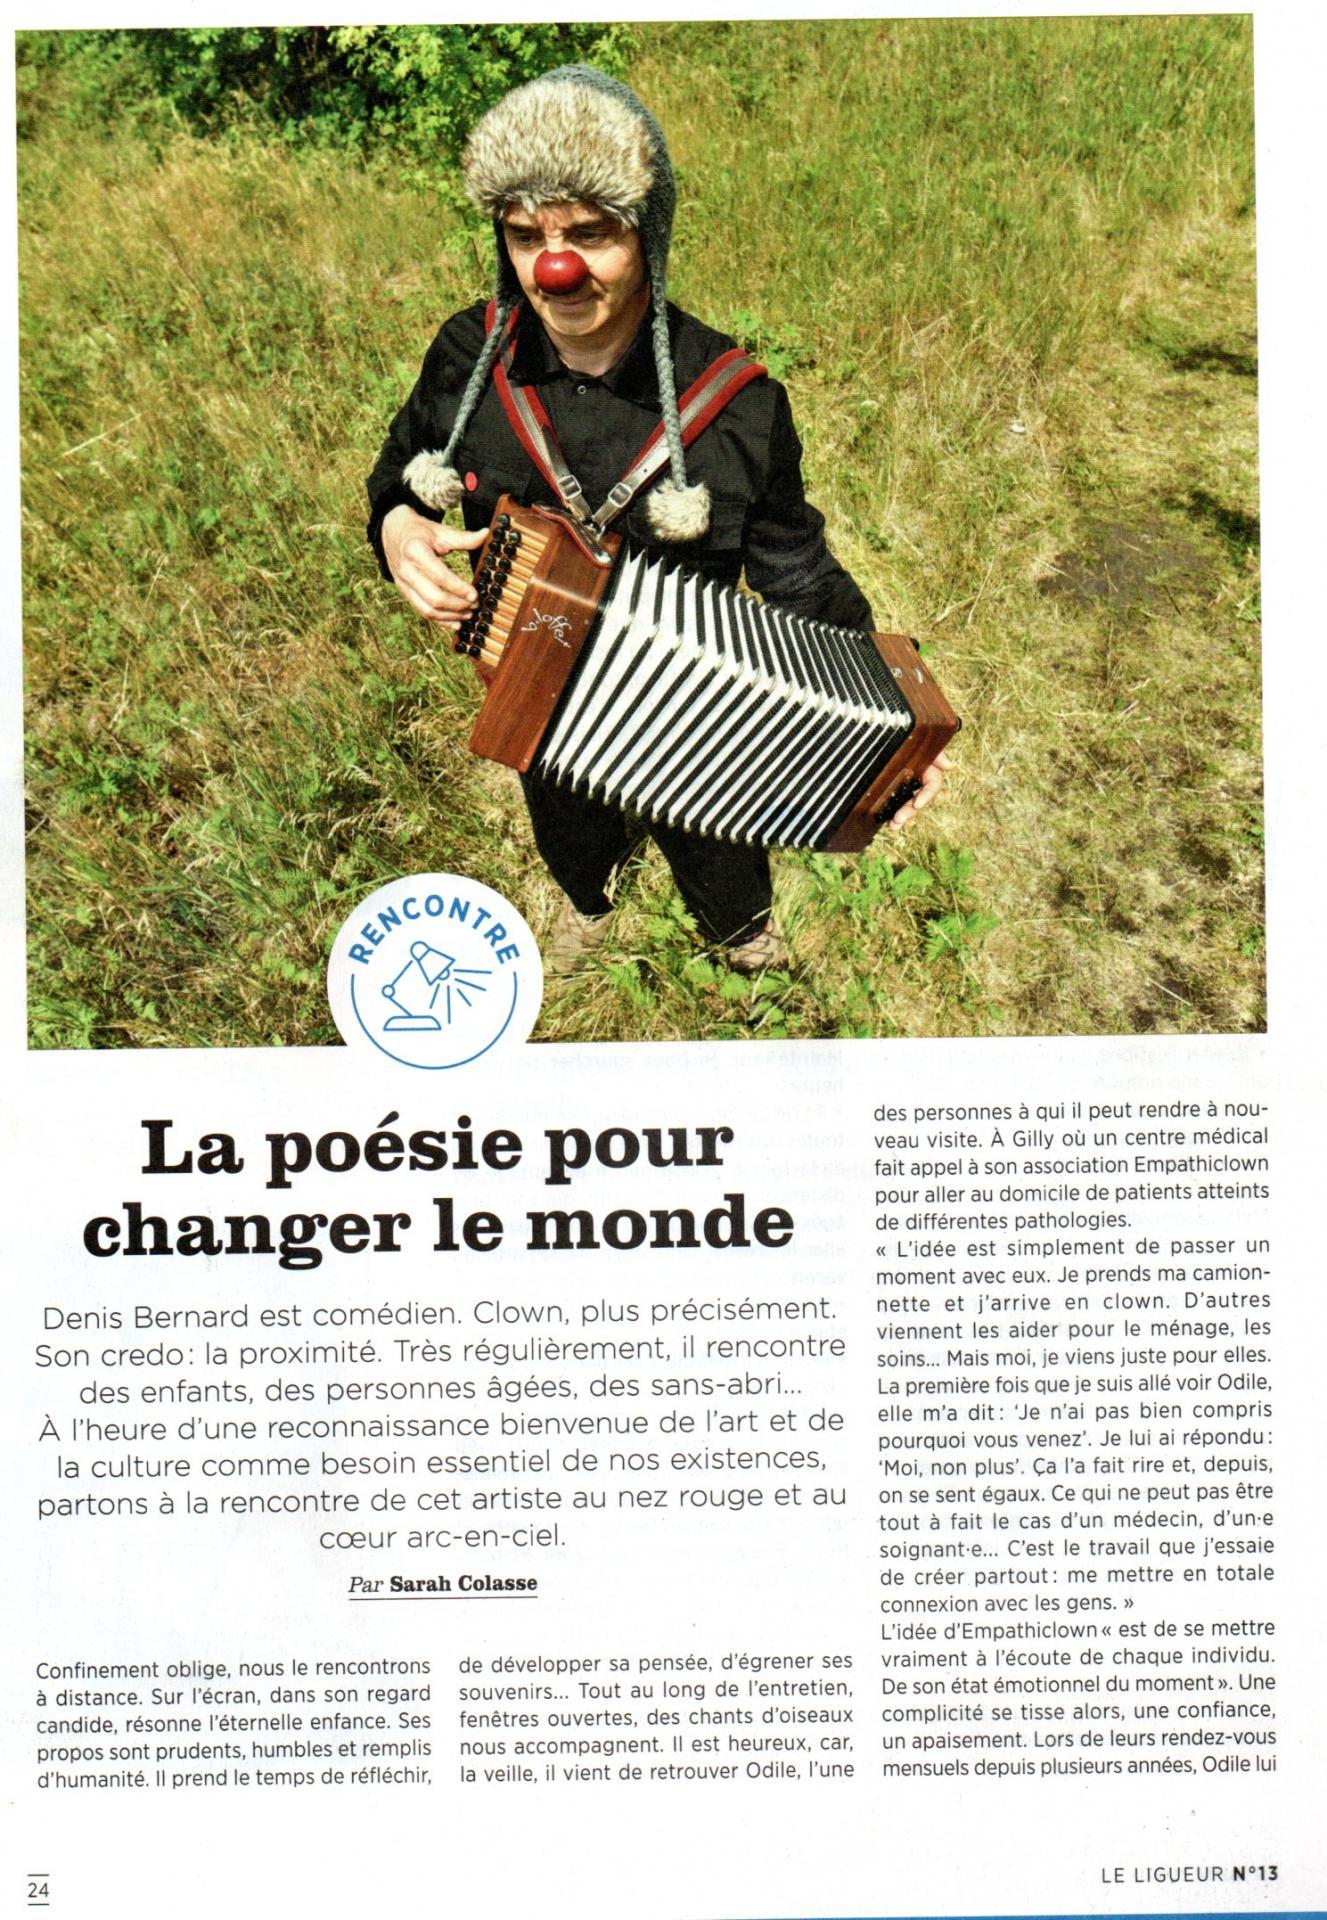 Ligueur 24 06 2020 1